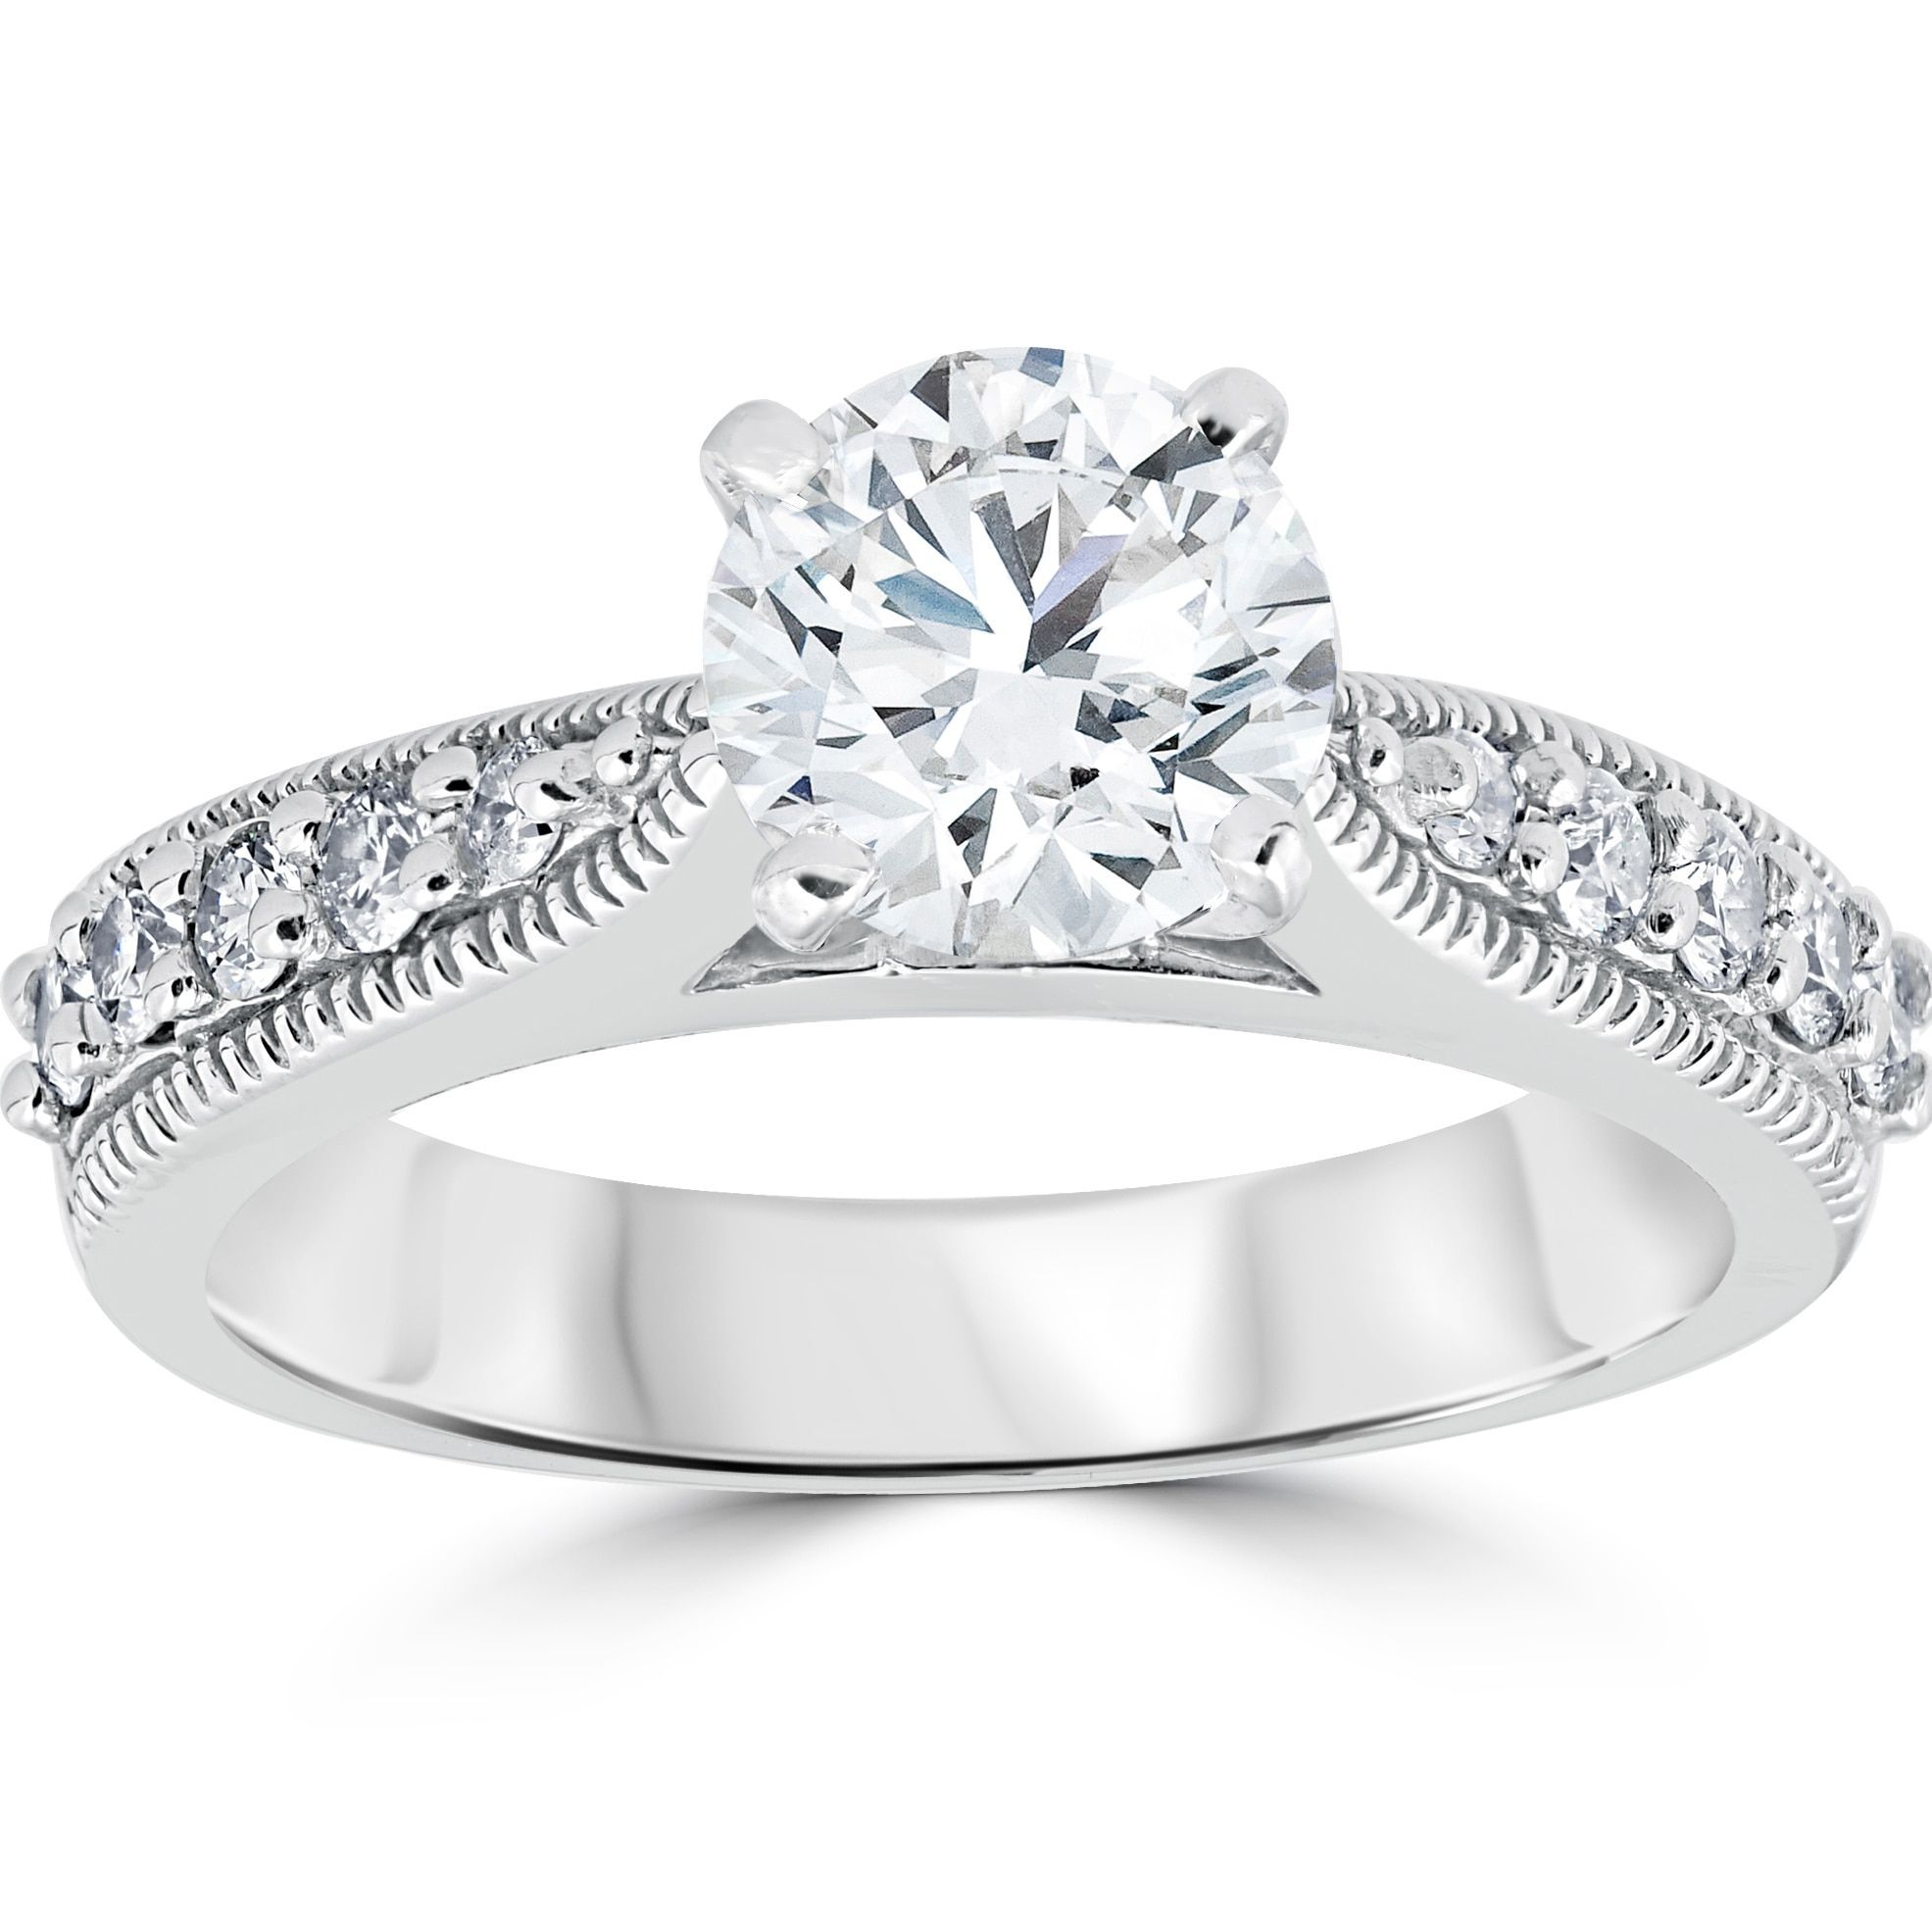 bliss 14k white gold 1 7 8 ct diamond clarity enhanced engagement